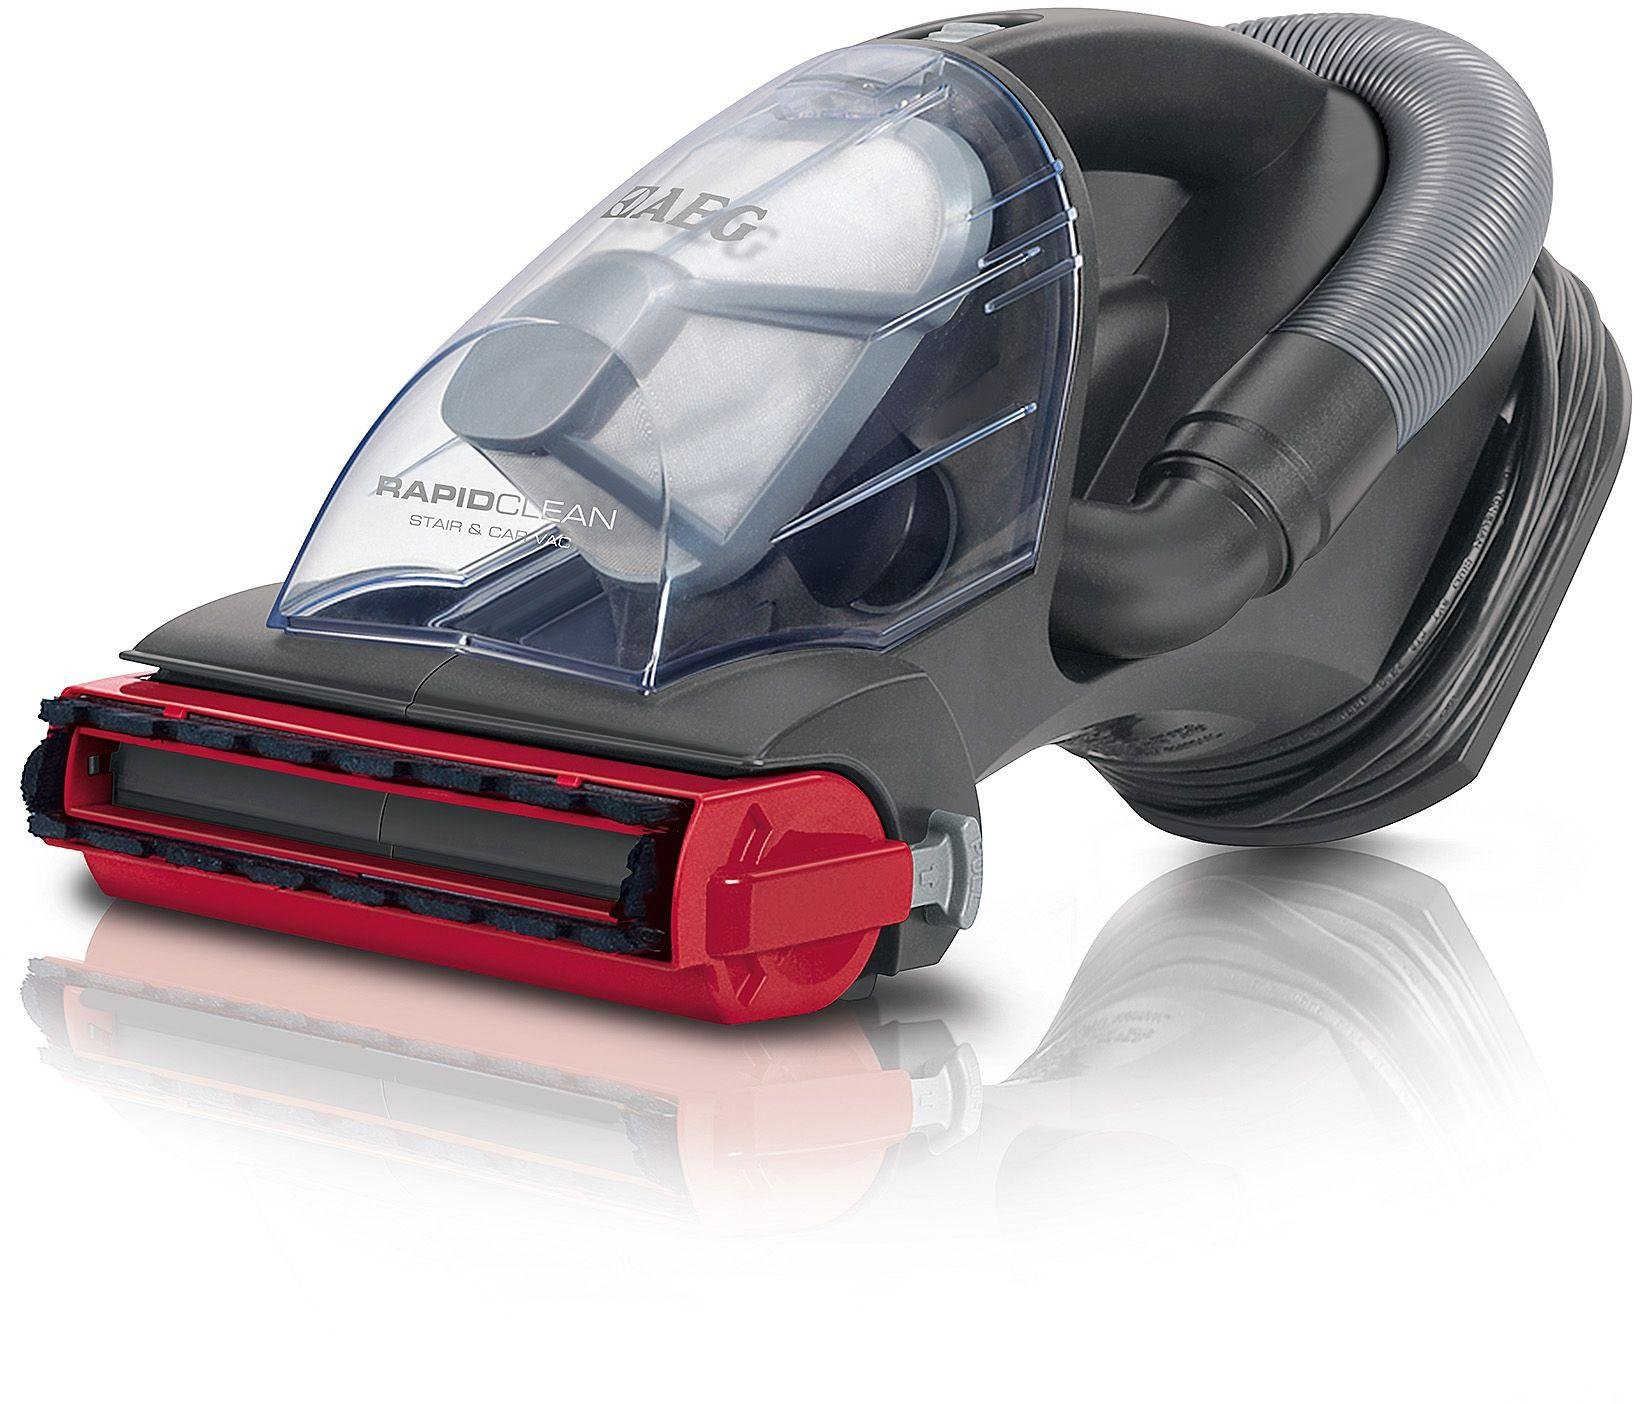 Image of AEG - RapidClean AG71A - Handheld Vacuum Cleaner